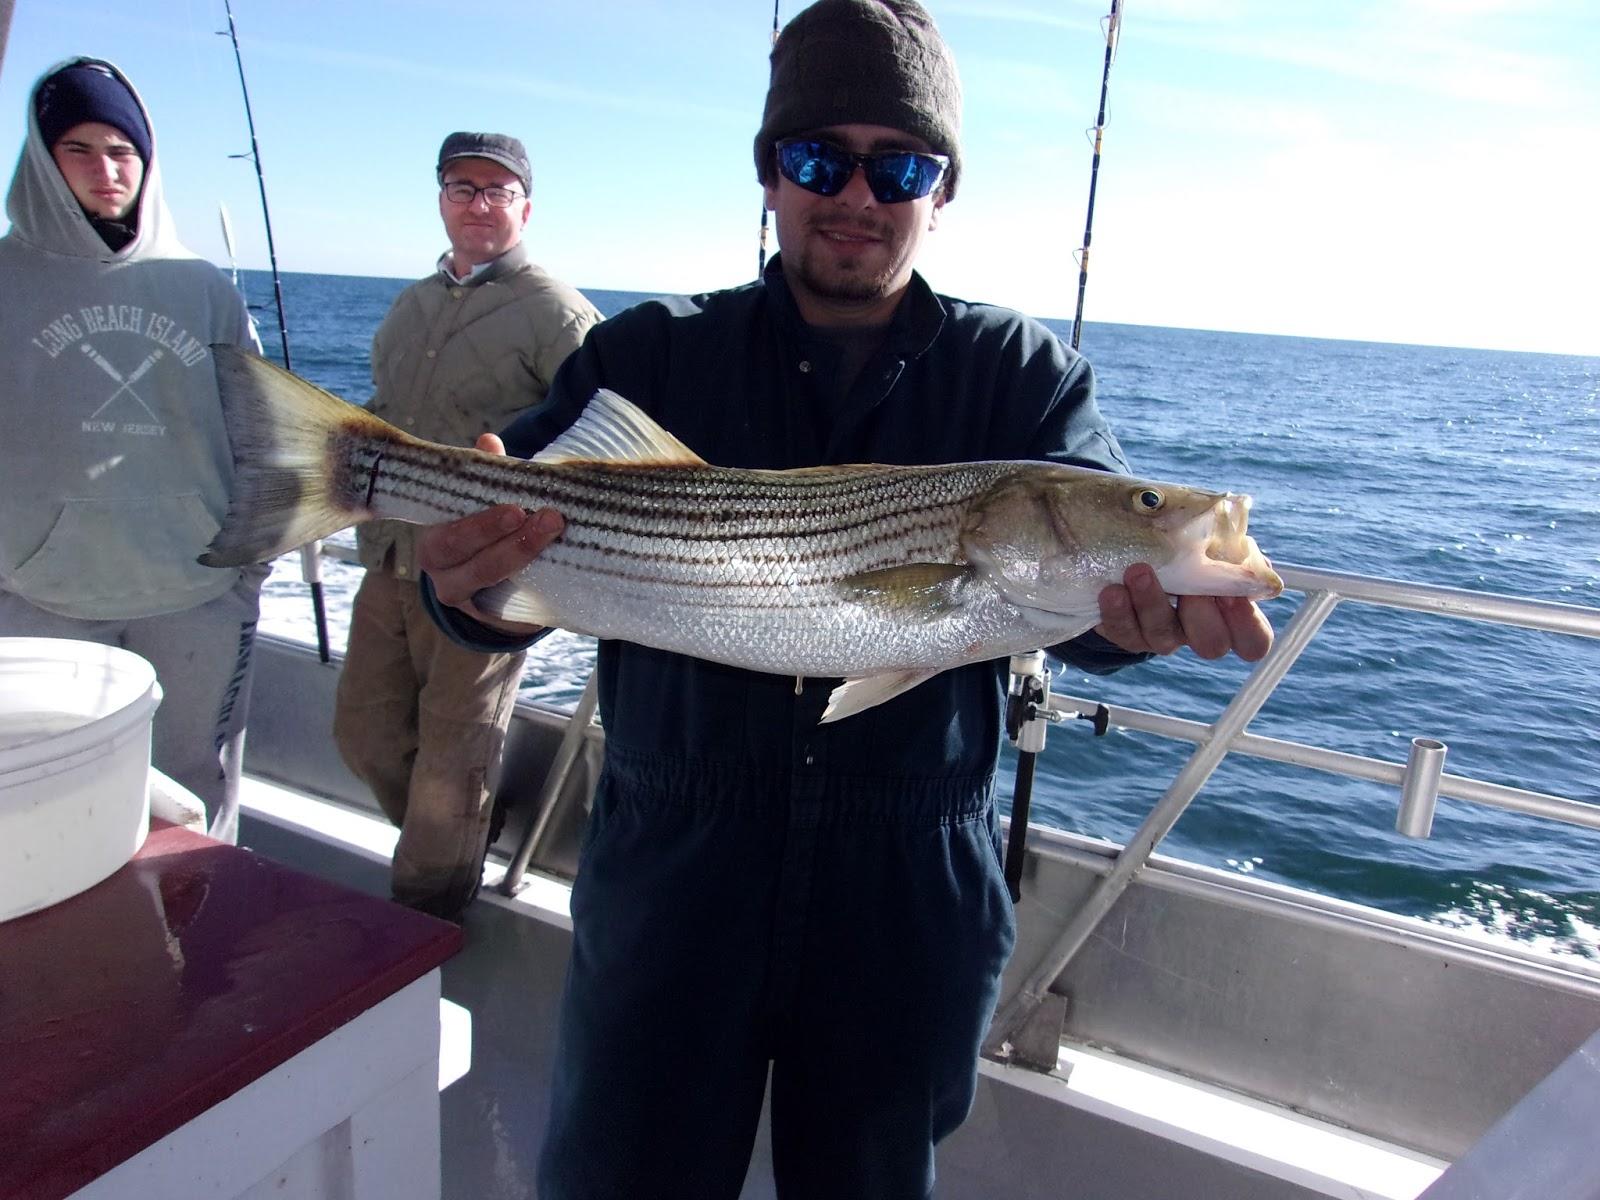 Nj salt fish 2017 11 25 seahunter atlantic highlands for Fishing license az price